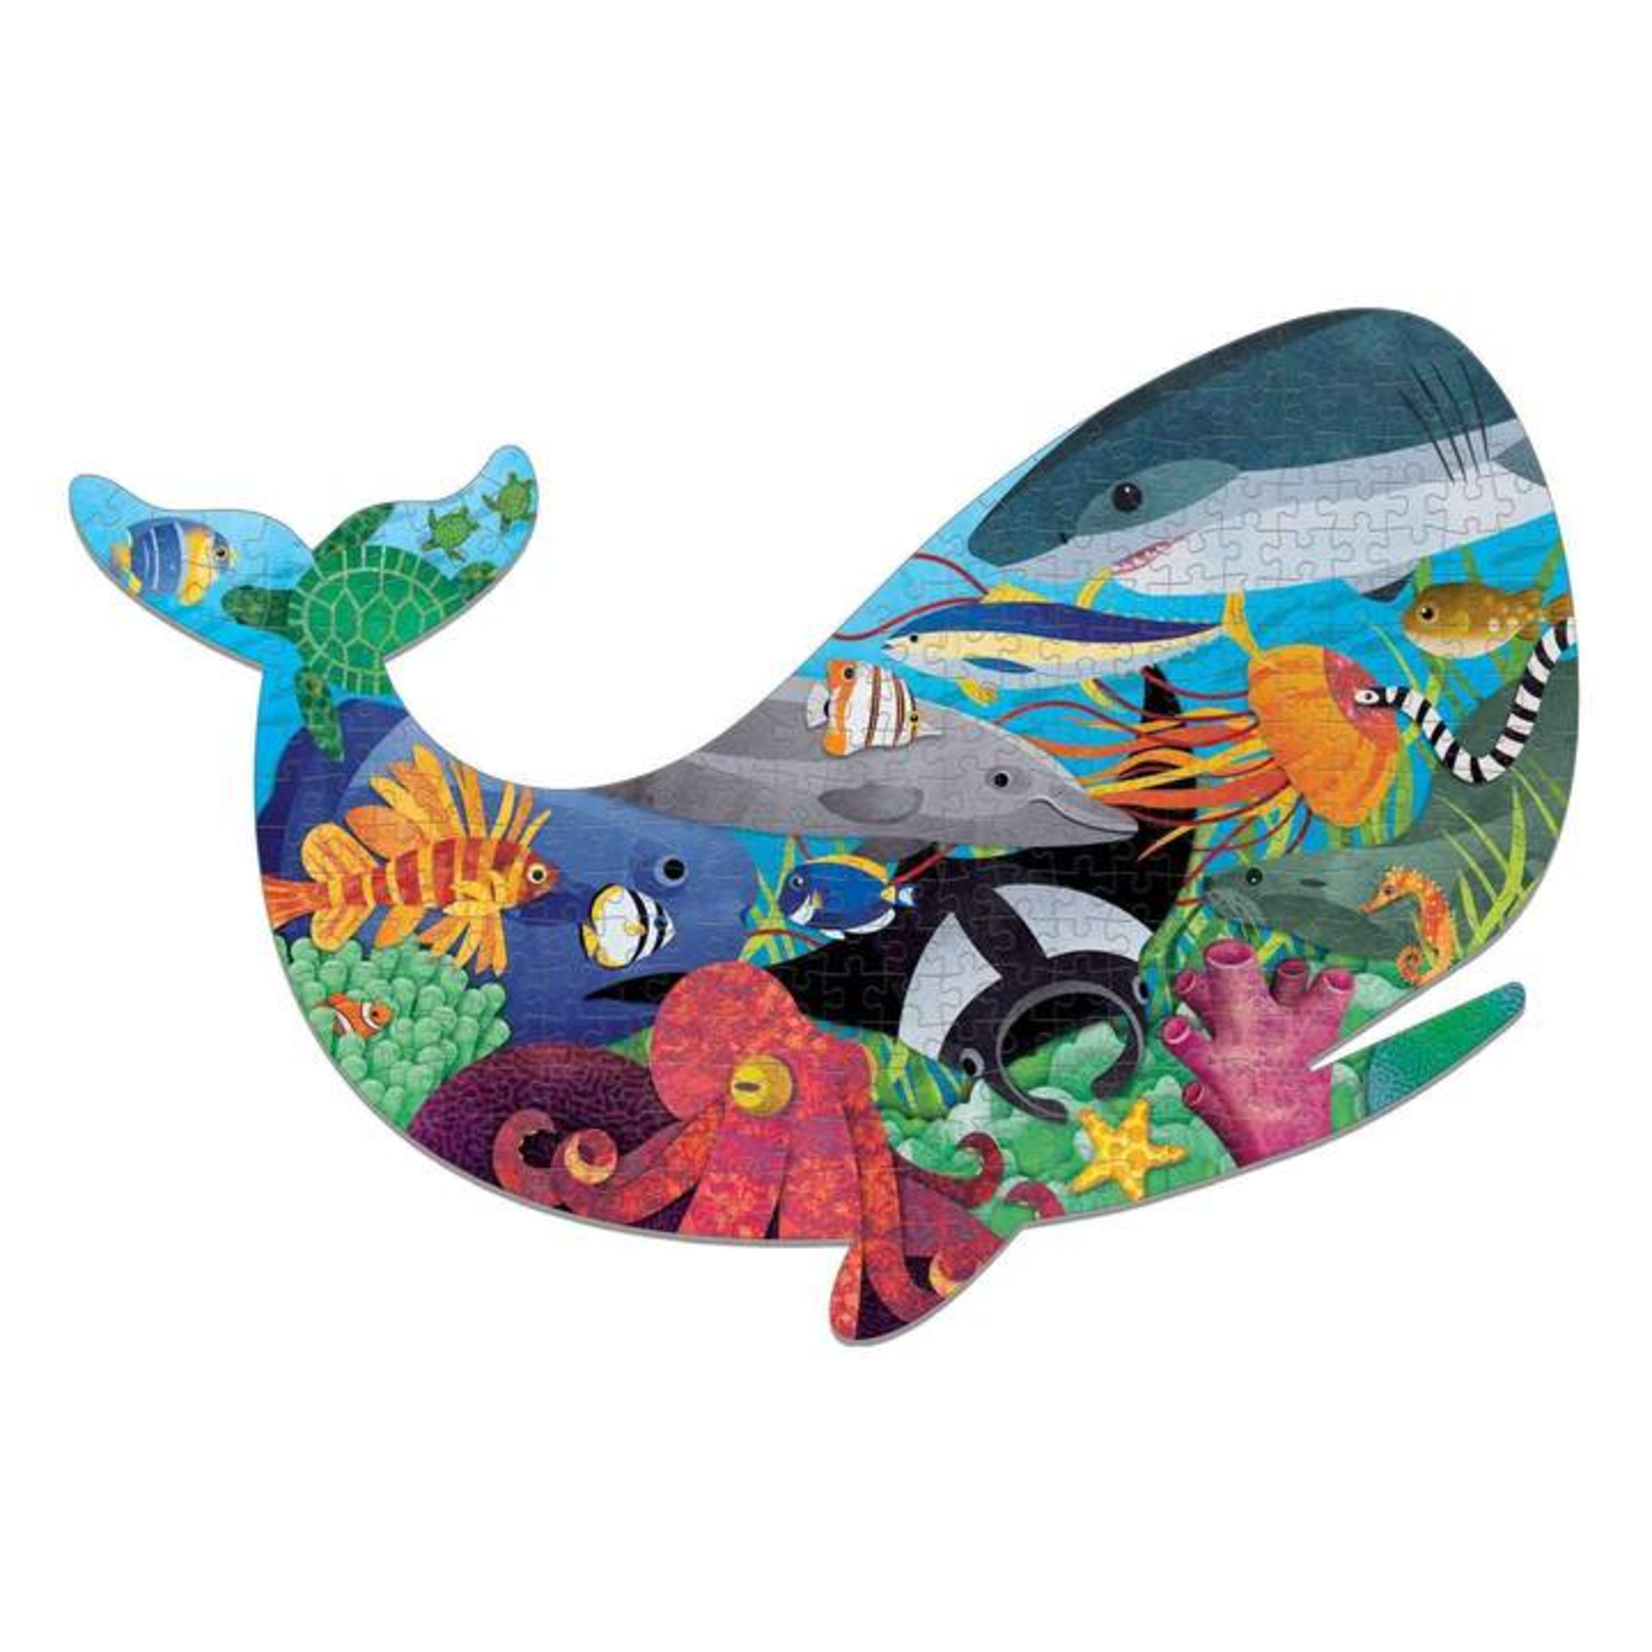 Mudpuppy Ocean Life Shaped 300pc